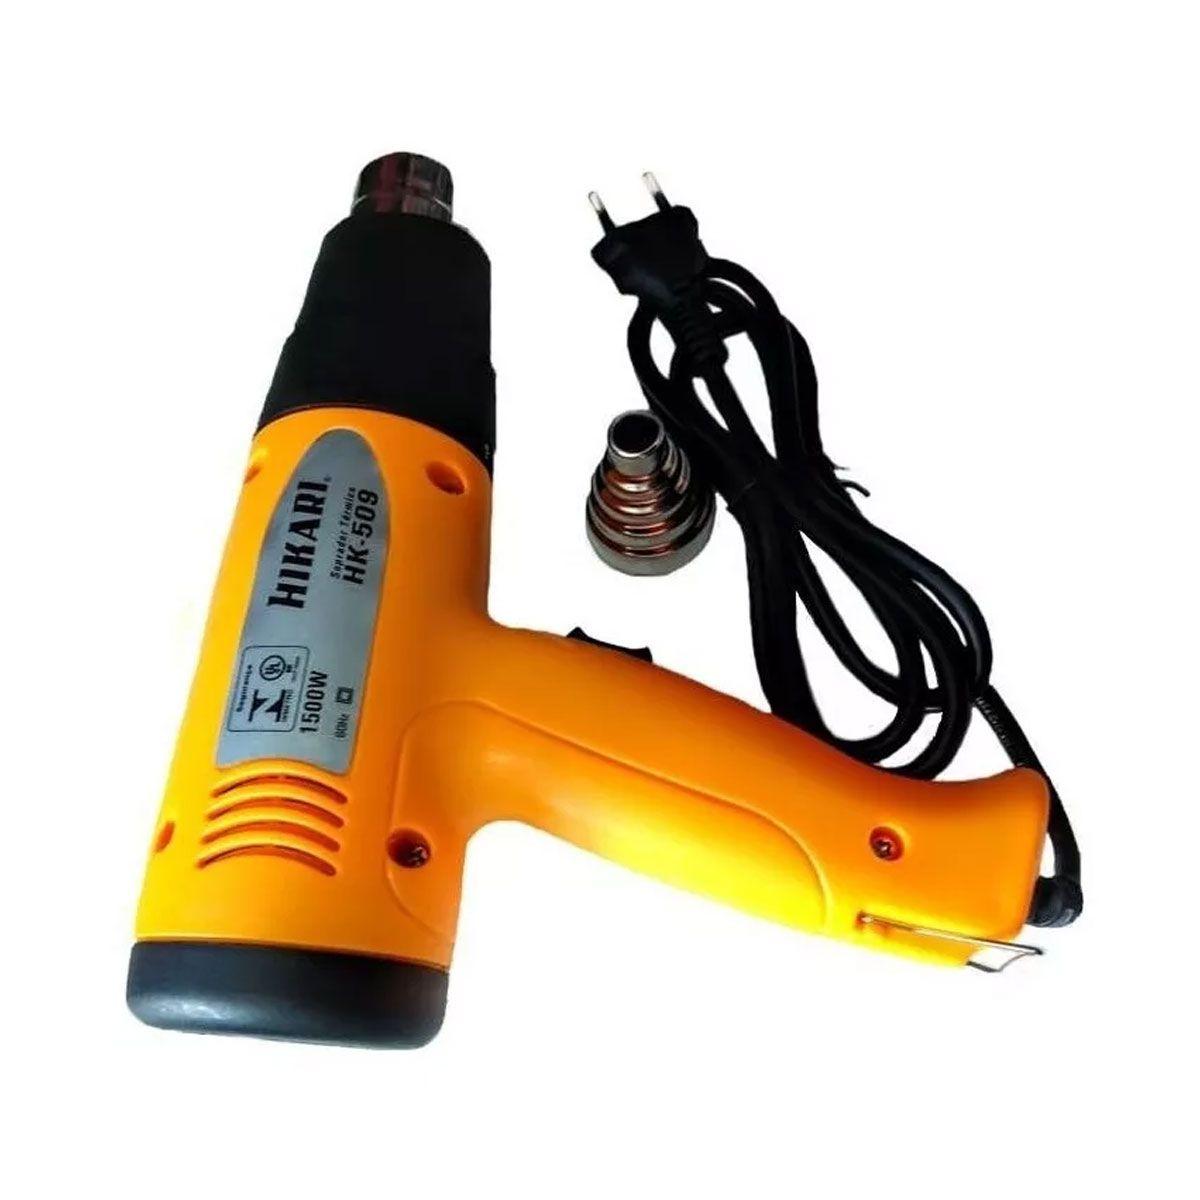 Soprador Térmico HK-509 220V - Hikari